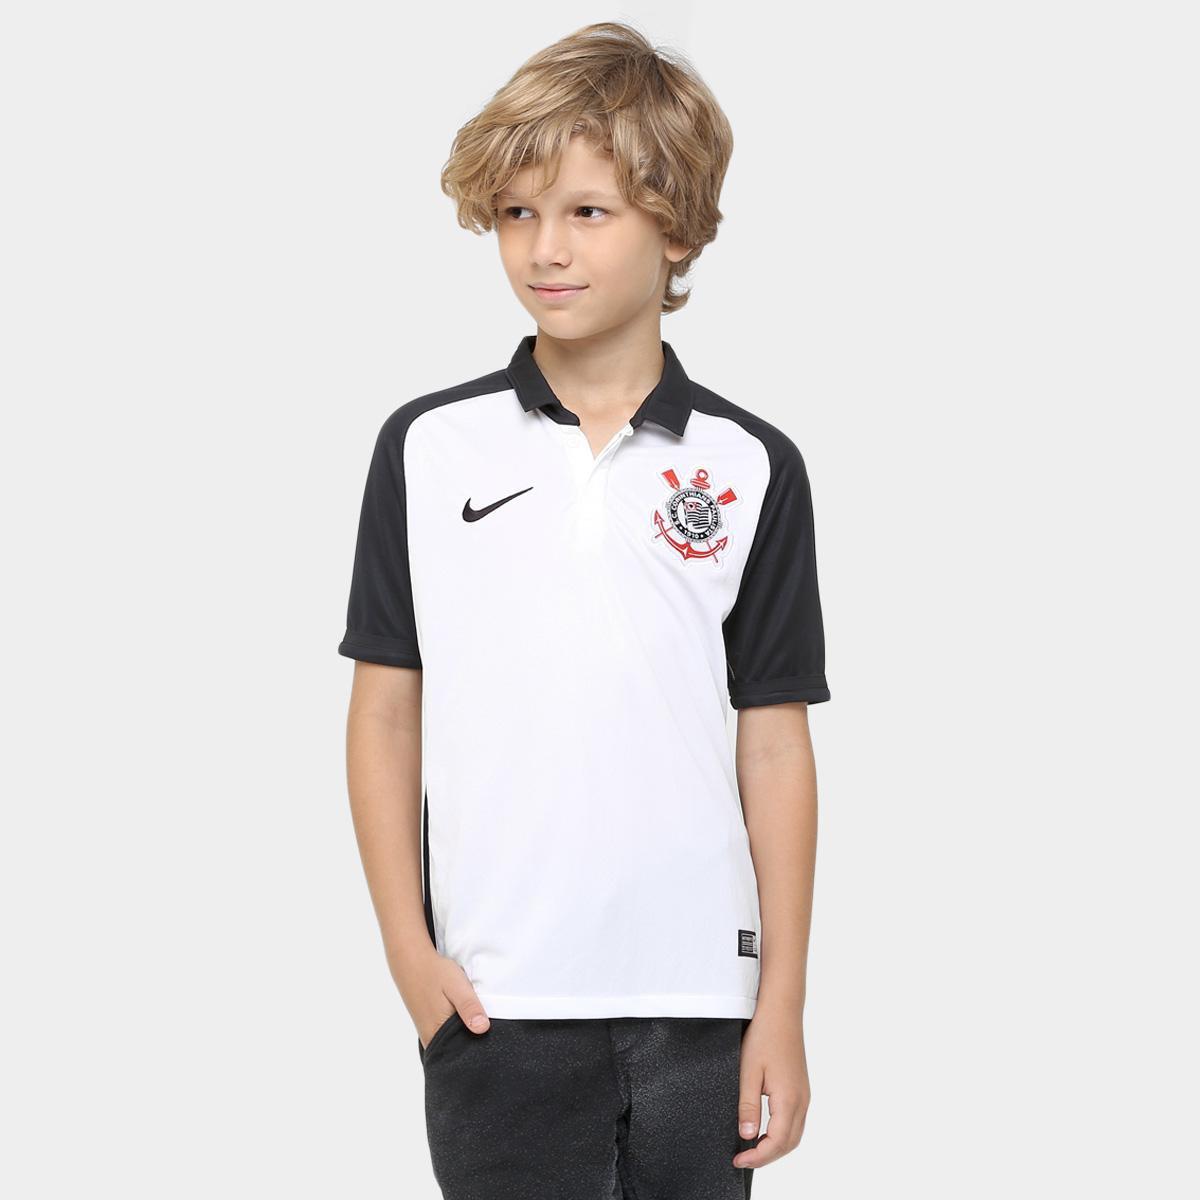 0e22aa7b0f136 Camisa Corinthians Infantil I 2016 s nº - Torcedor Nike Masculina - Compre  Agora